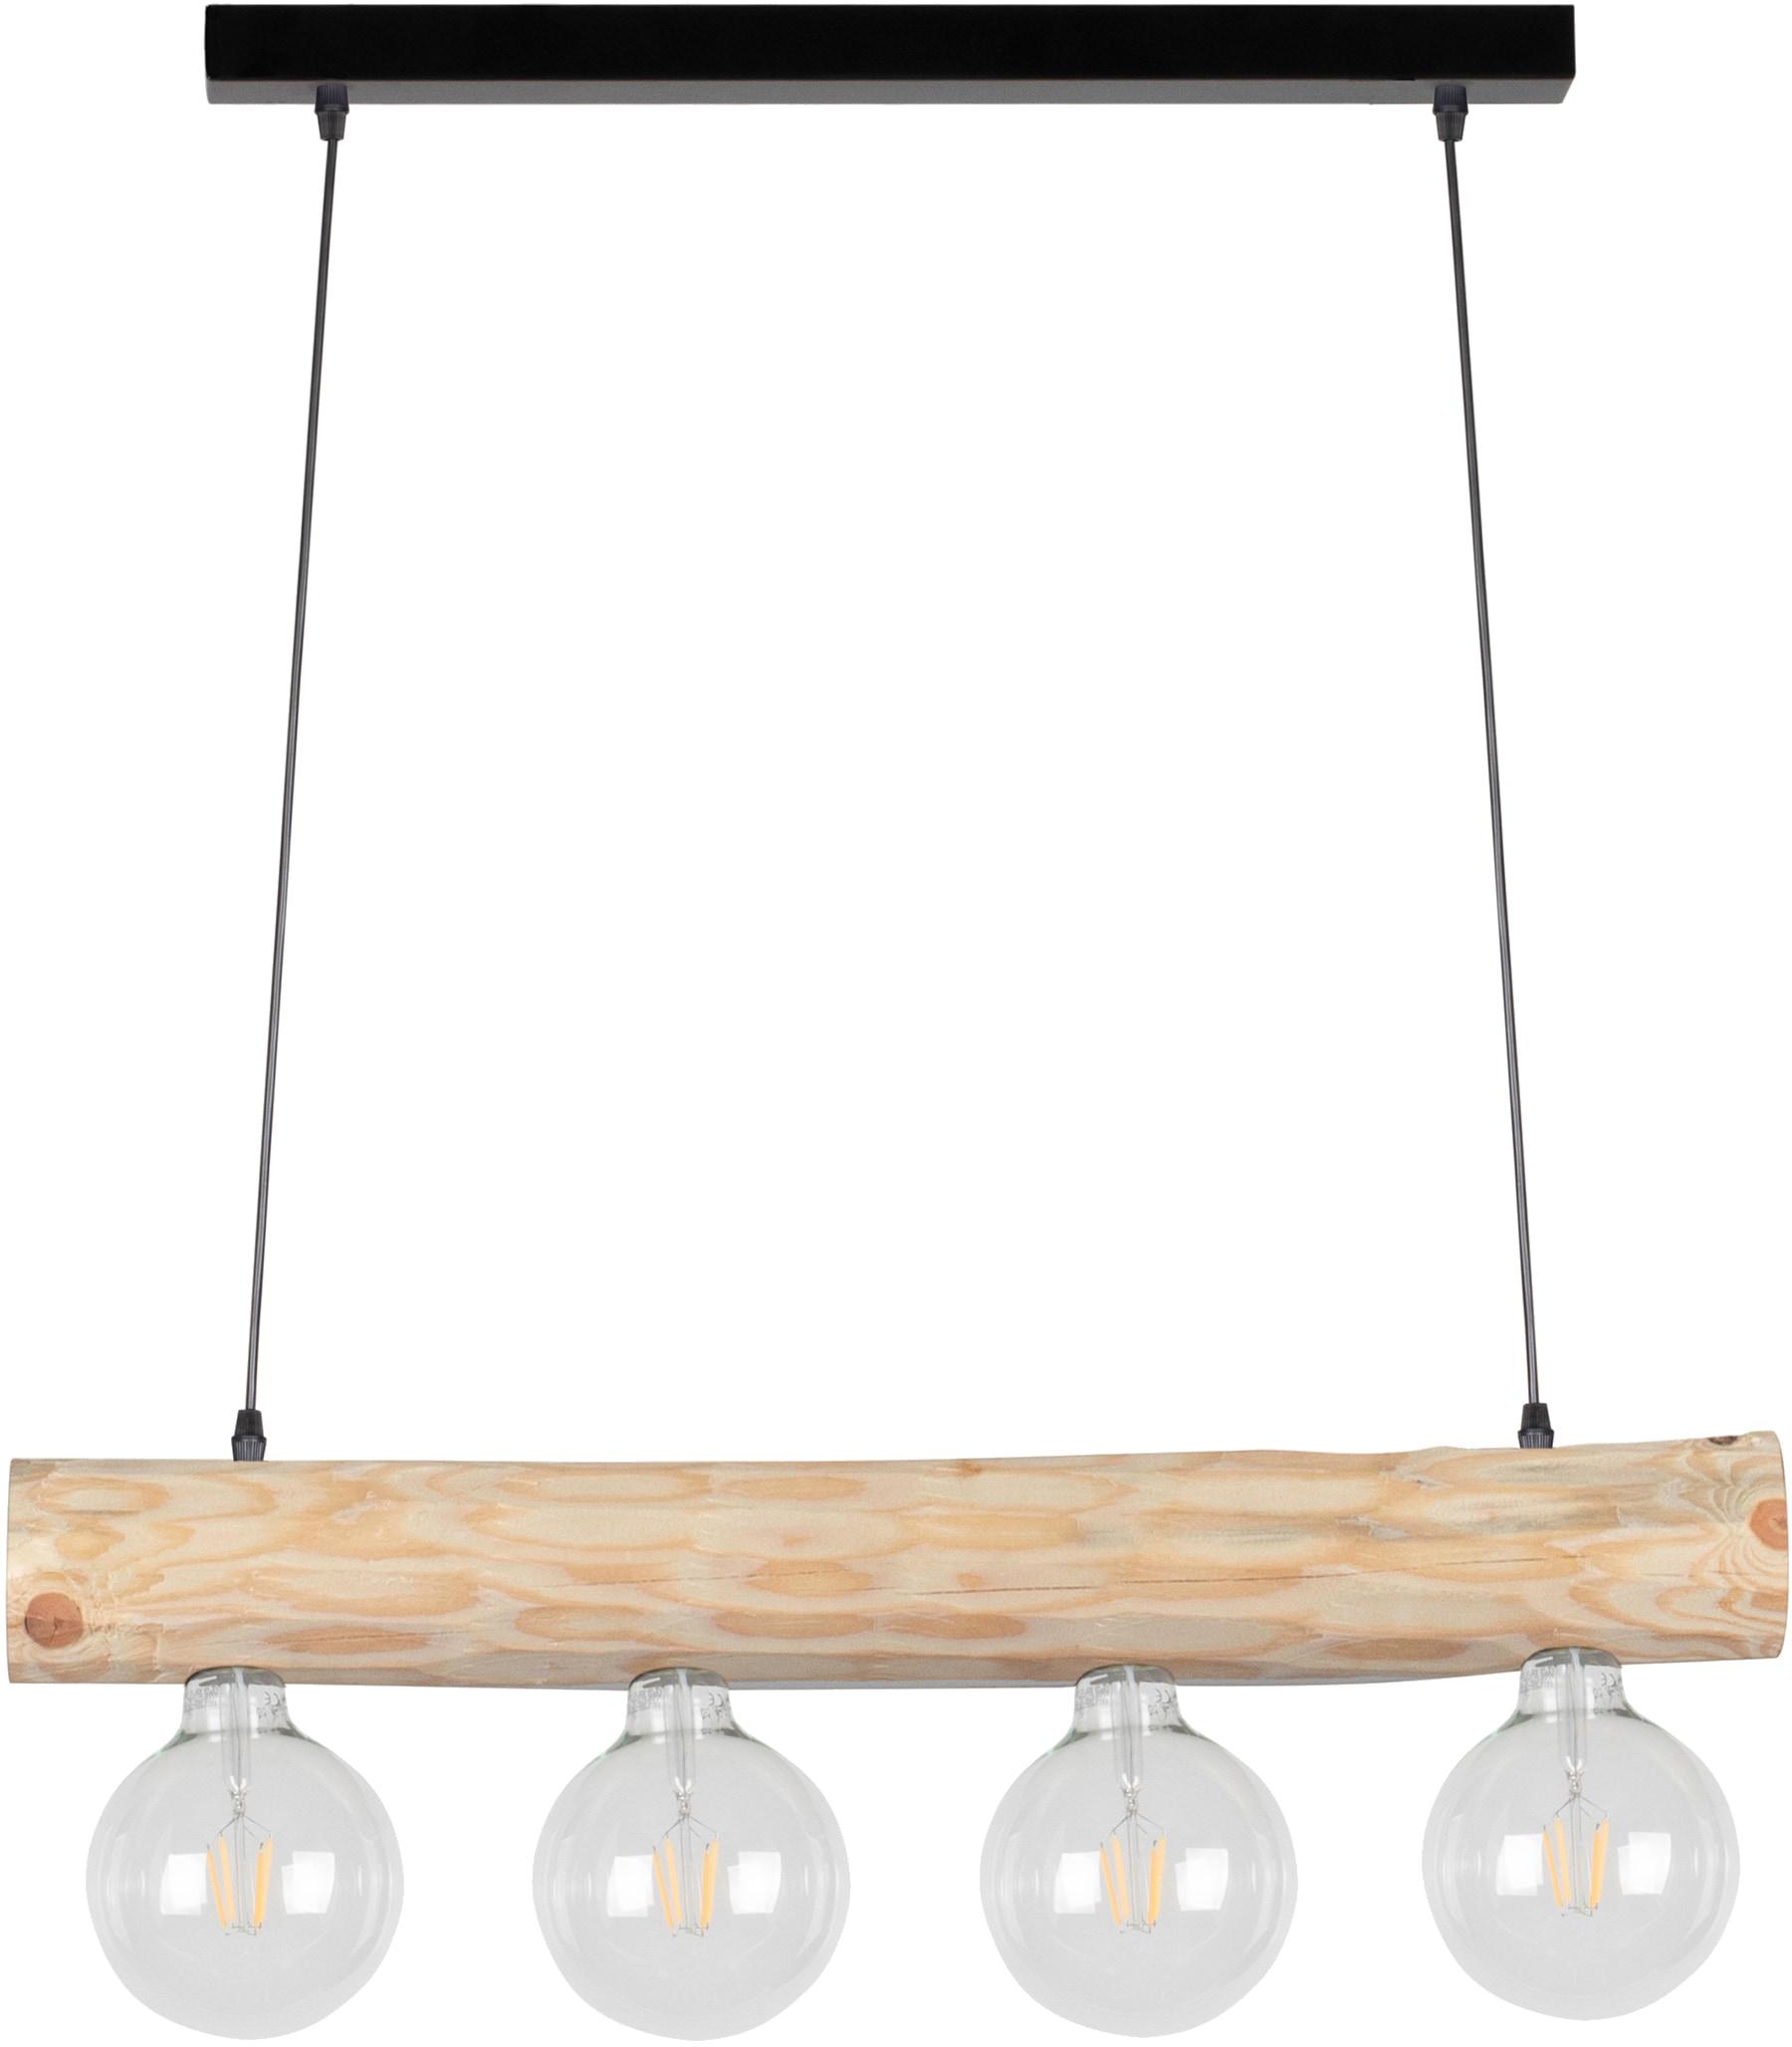 SPOT Light Pendelleuchte TRABO SIMPLE, E27, Hängeleuchte, Holzbalken aus massivem Kiefernholz Ø 8-12 cm, Passende LM E27/exklusive, Made in Europe